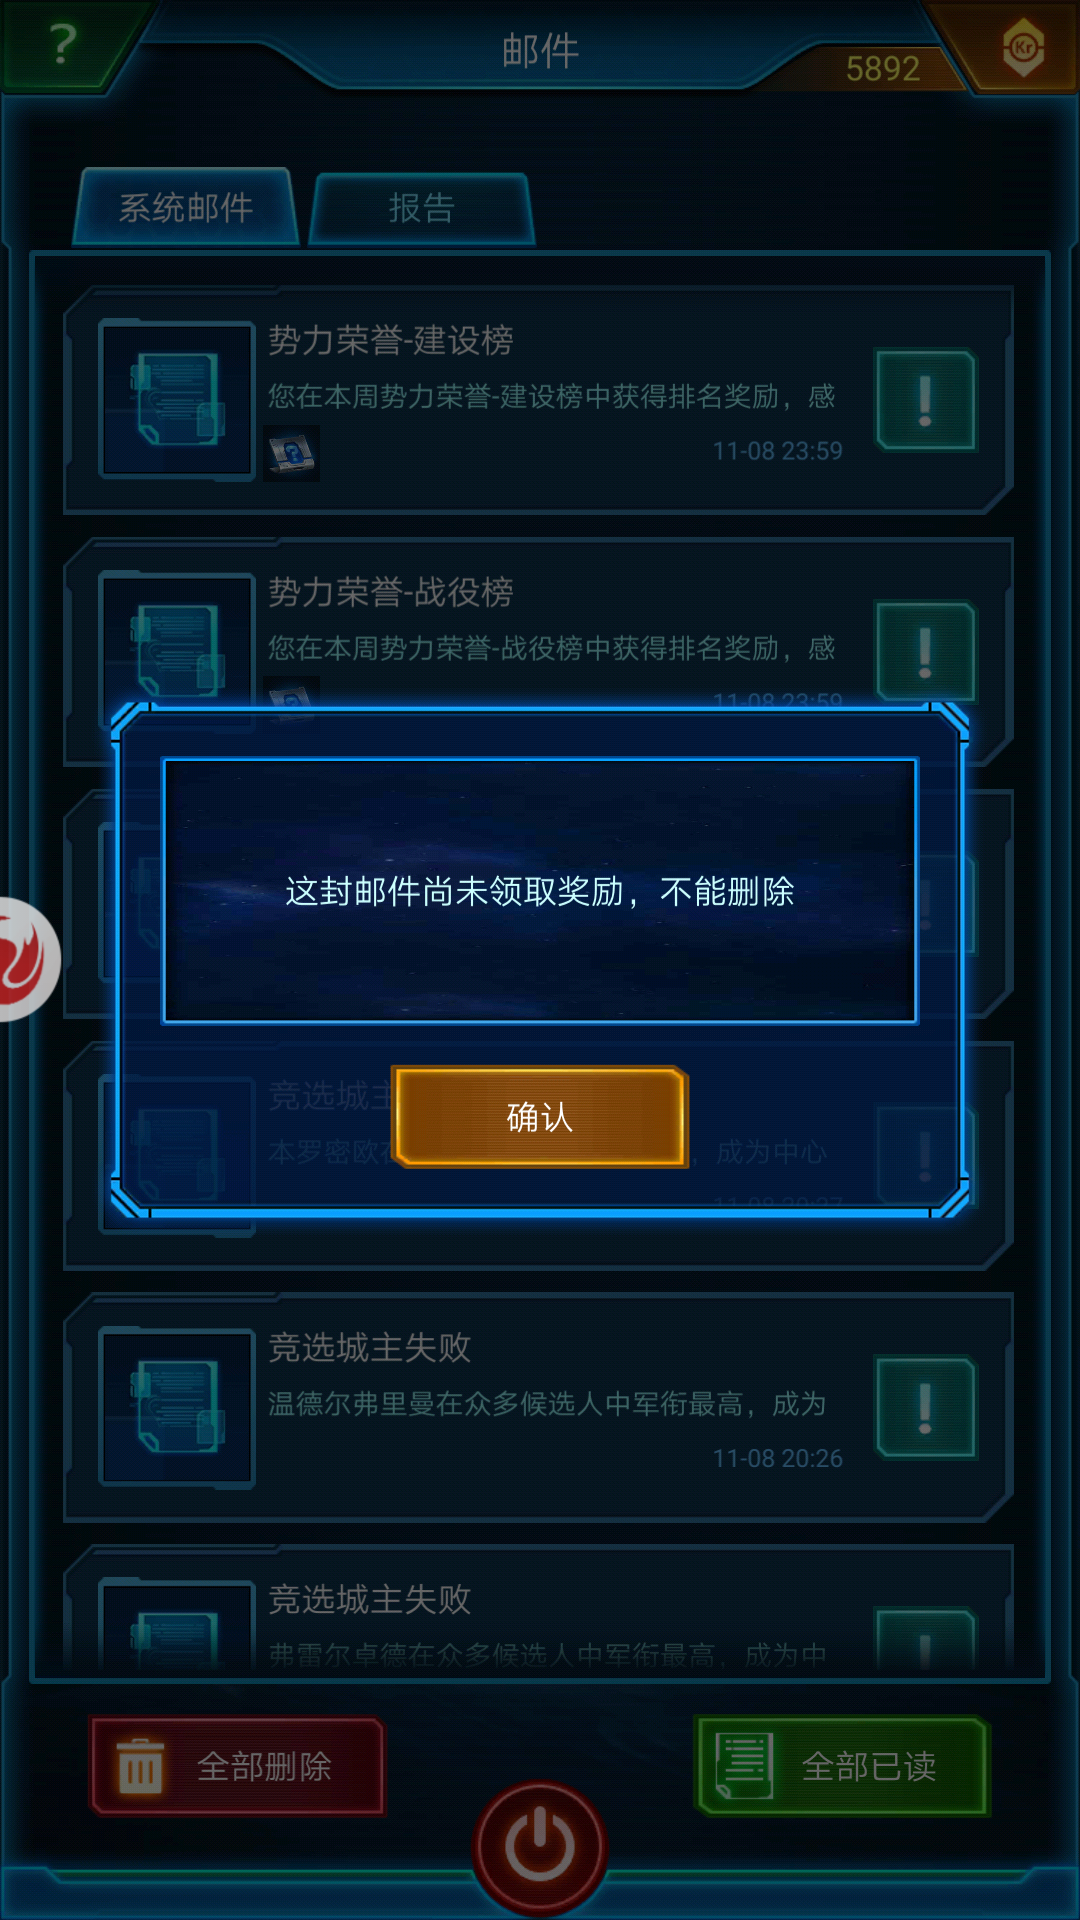 Screenshot_2018-11-09-00-06-42-88.png